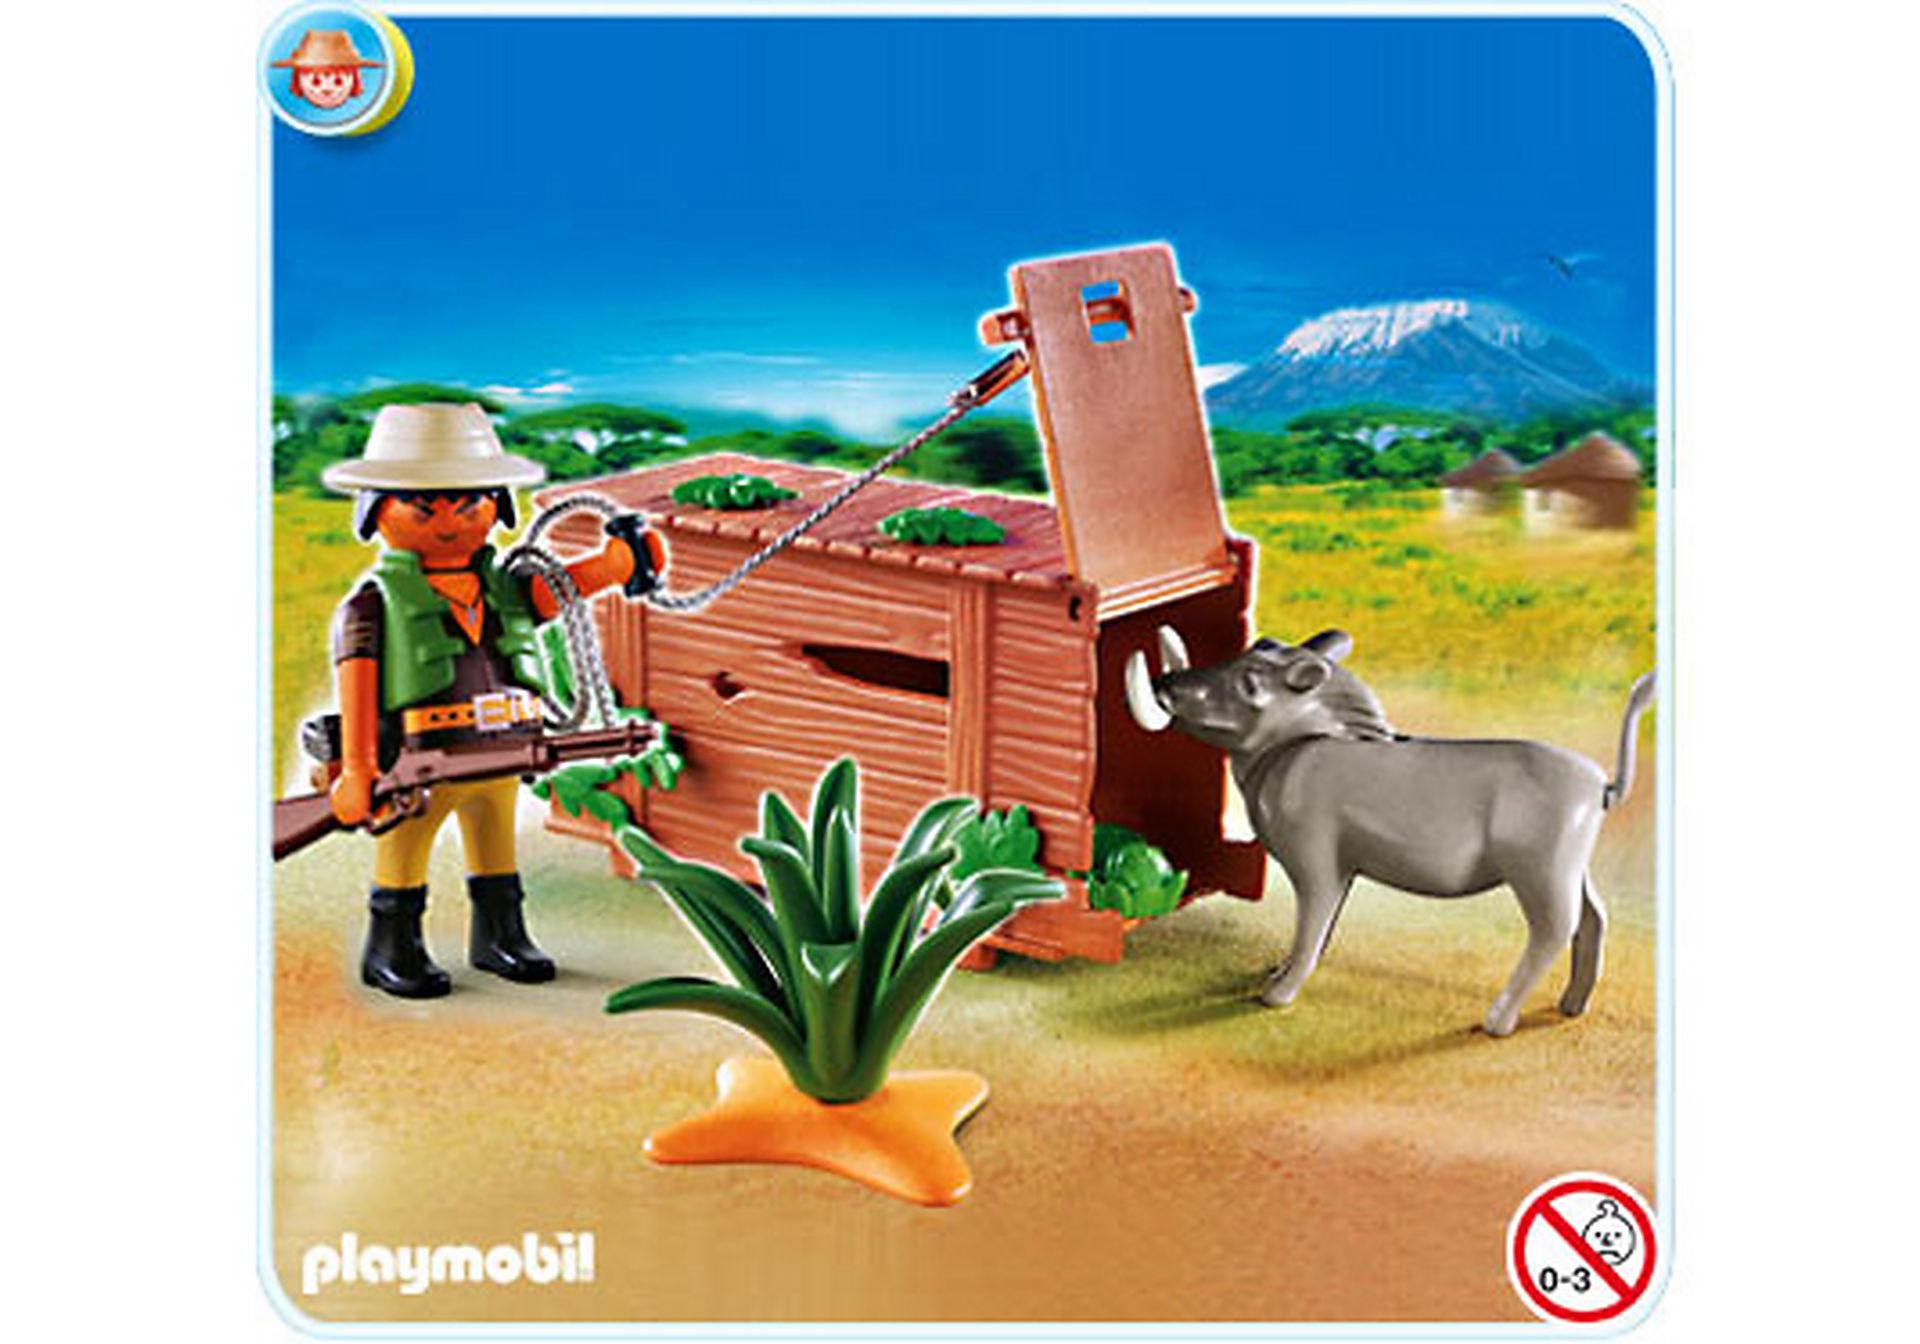 http://media.playmobil.com/i/playmobil/4833-A_product_detail/Chasseur avec piège